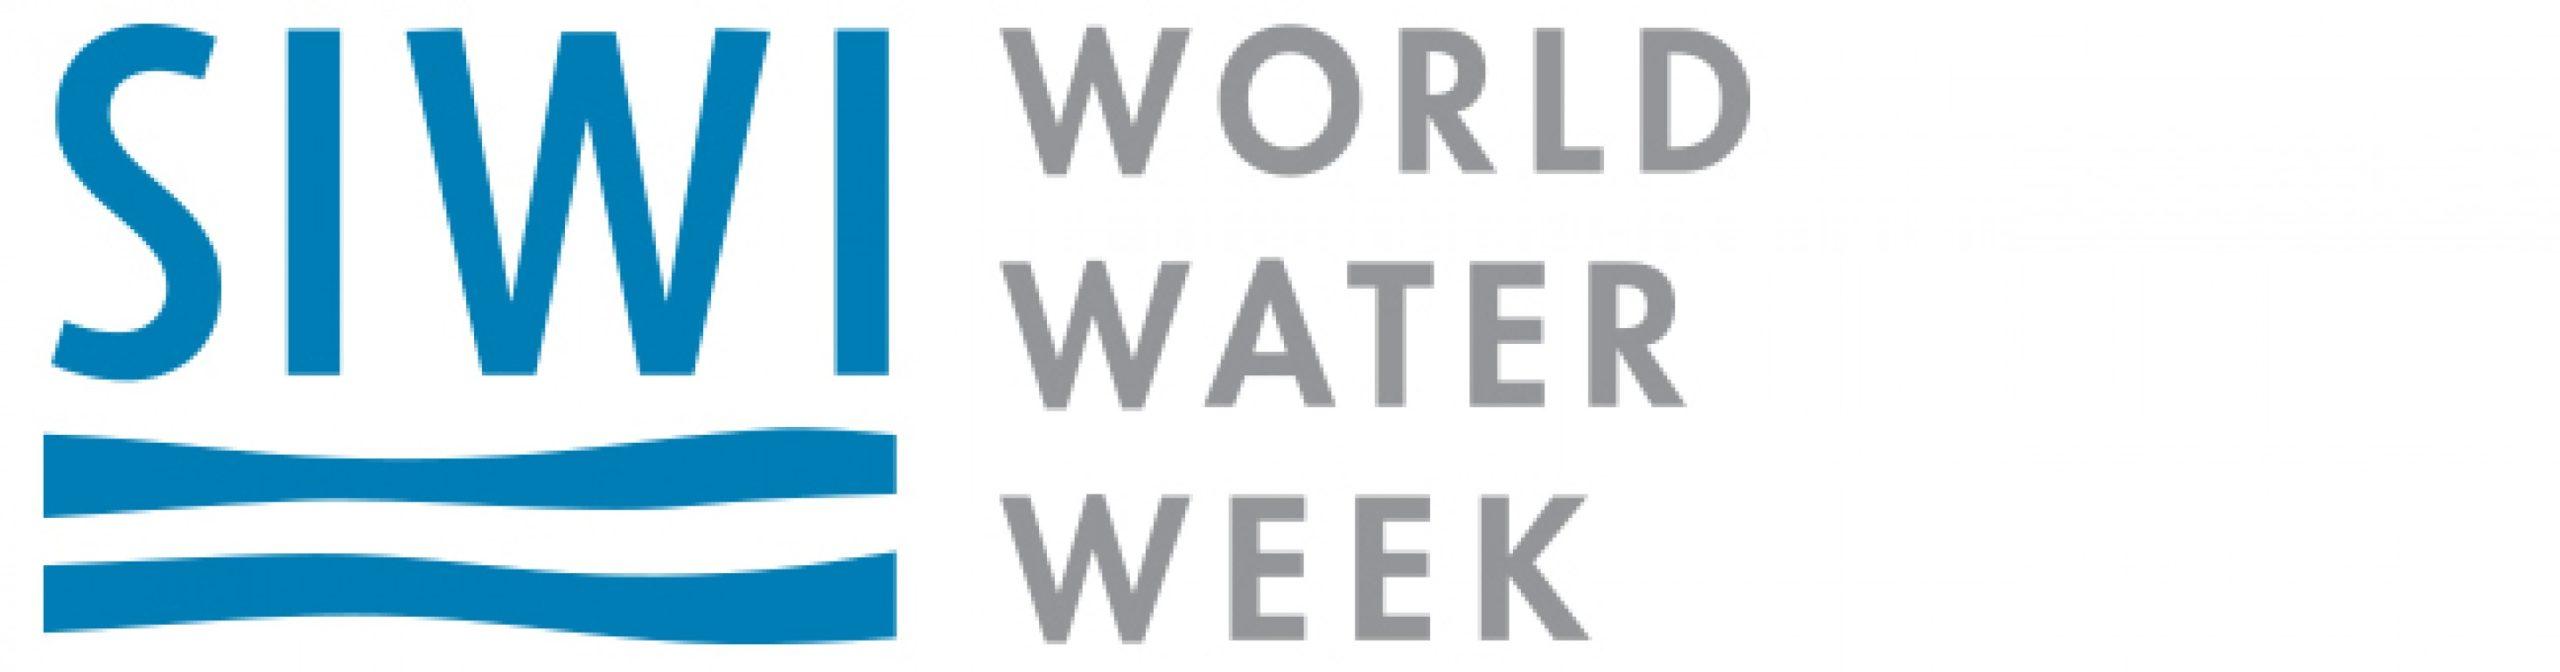 World Water Week 2018